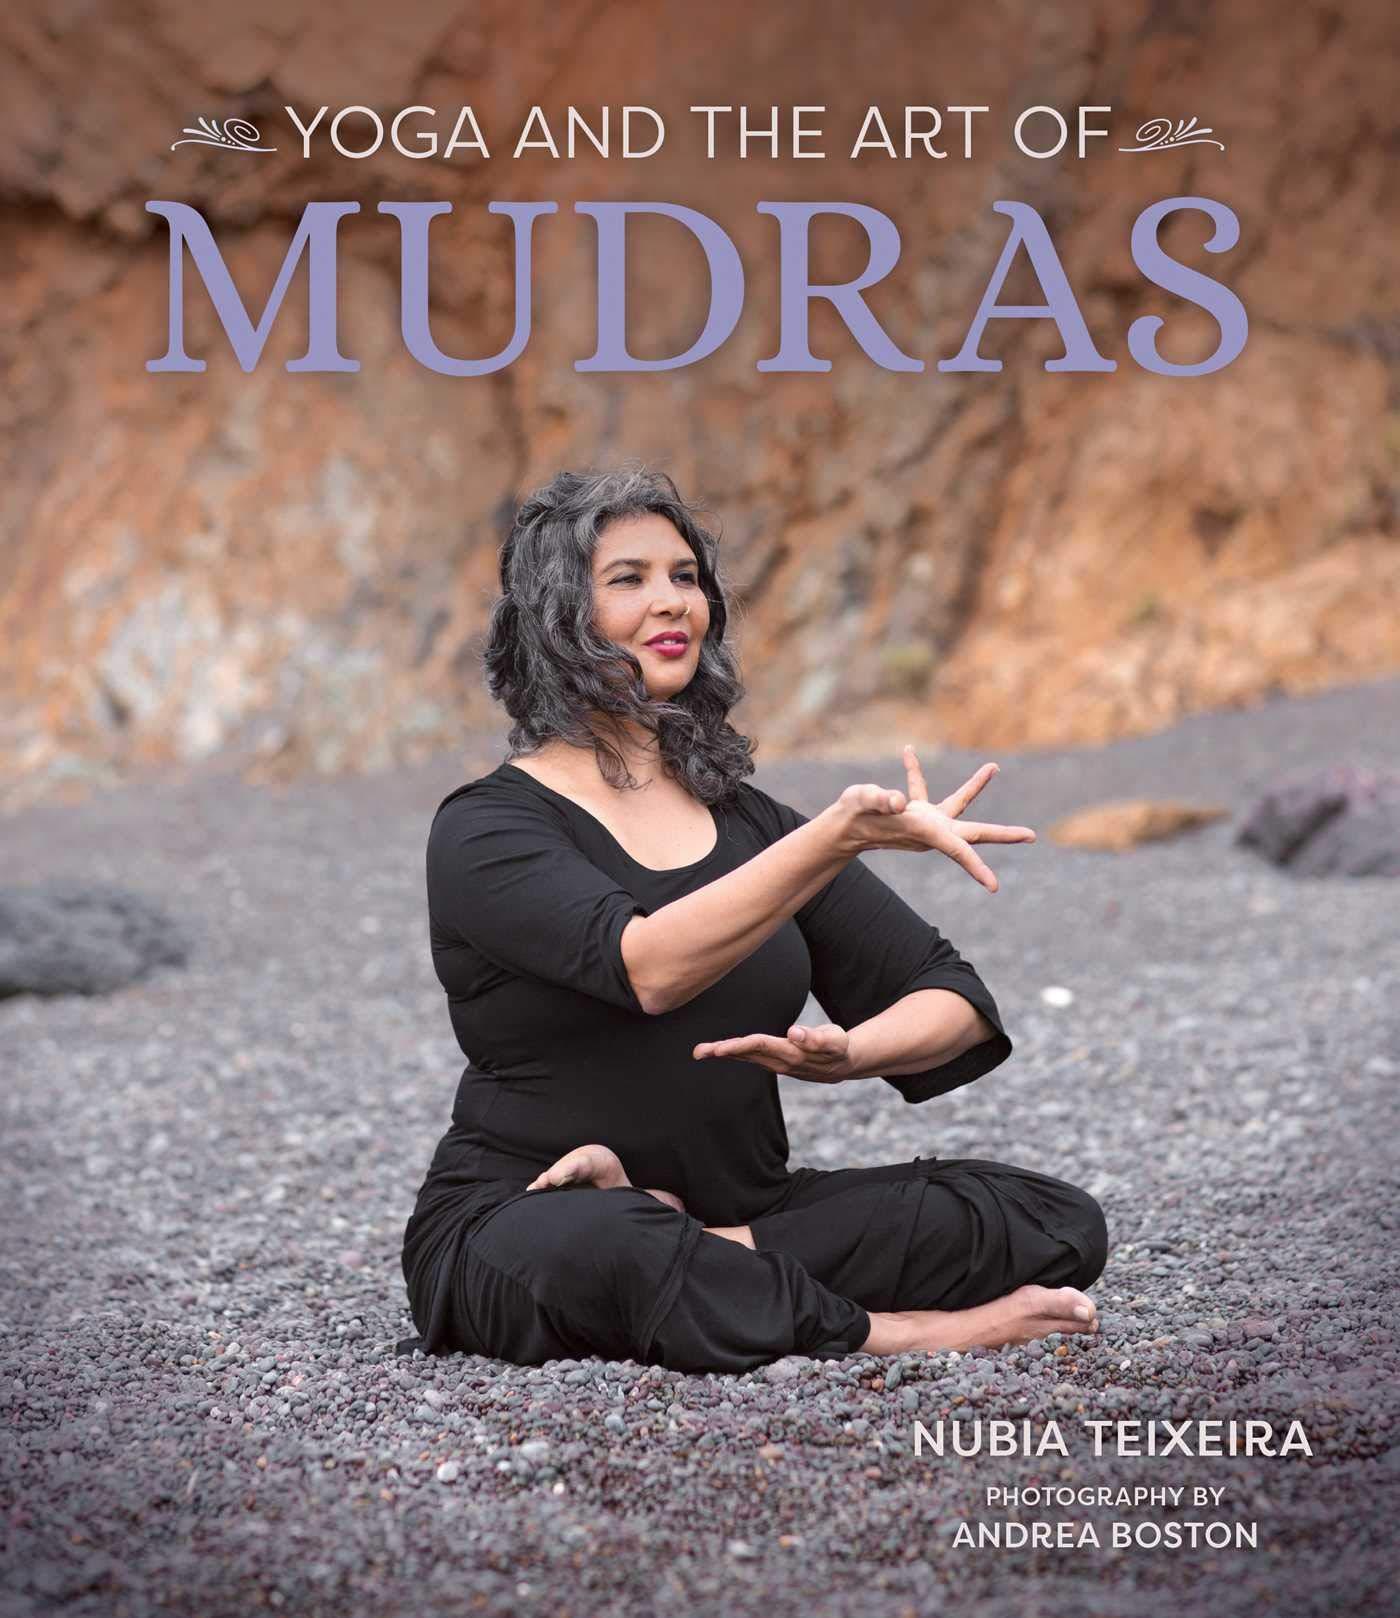 Yoga and the Art of Mudras: Nubia Teixeira, Andrea Boston